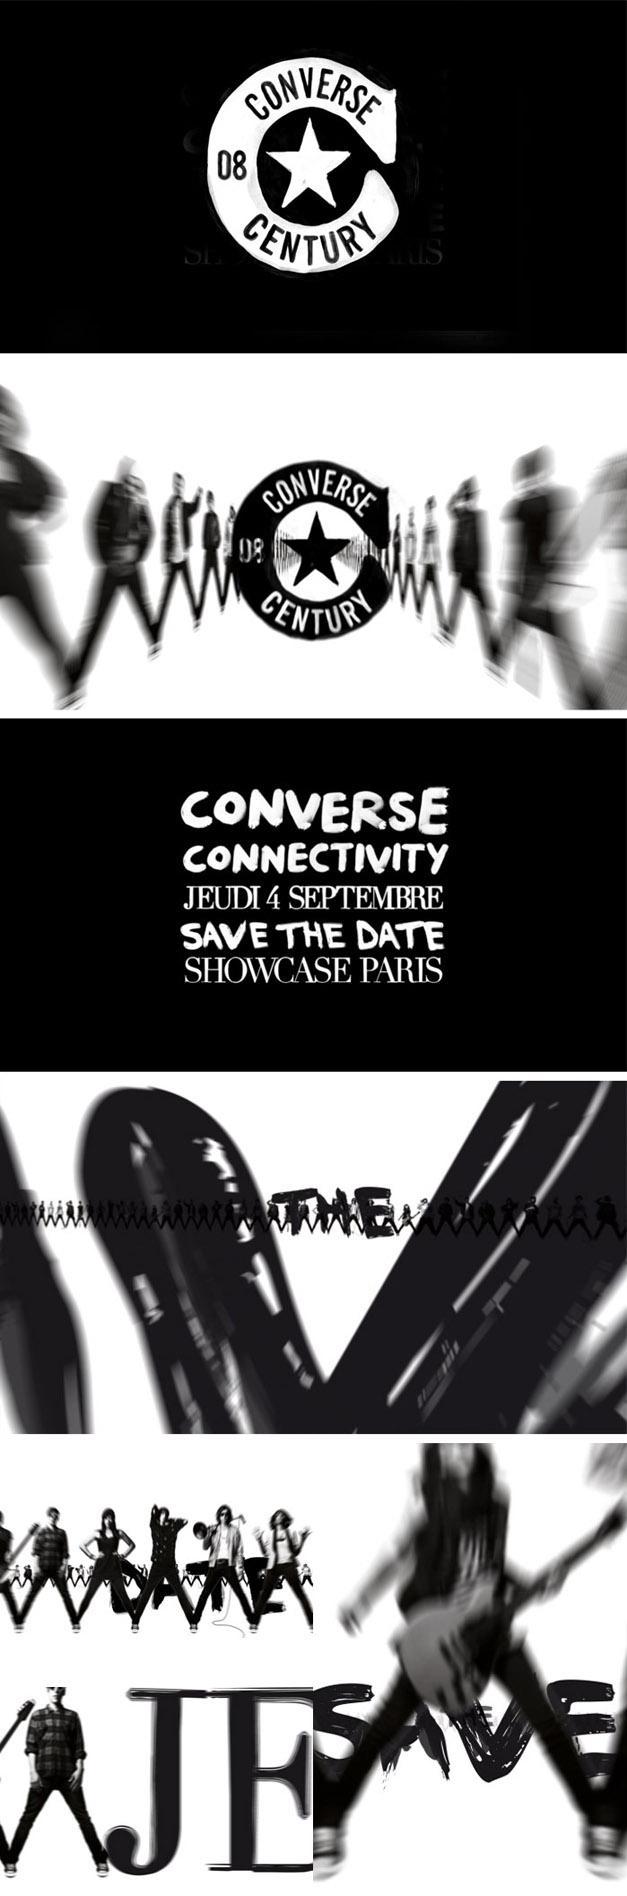 converse | Agence VERTU